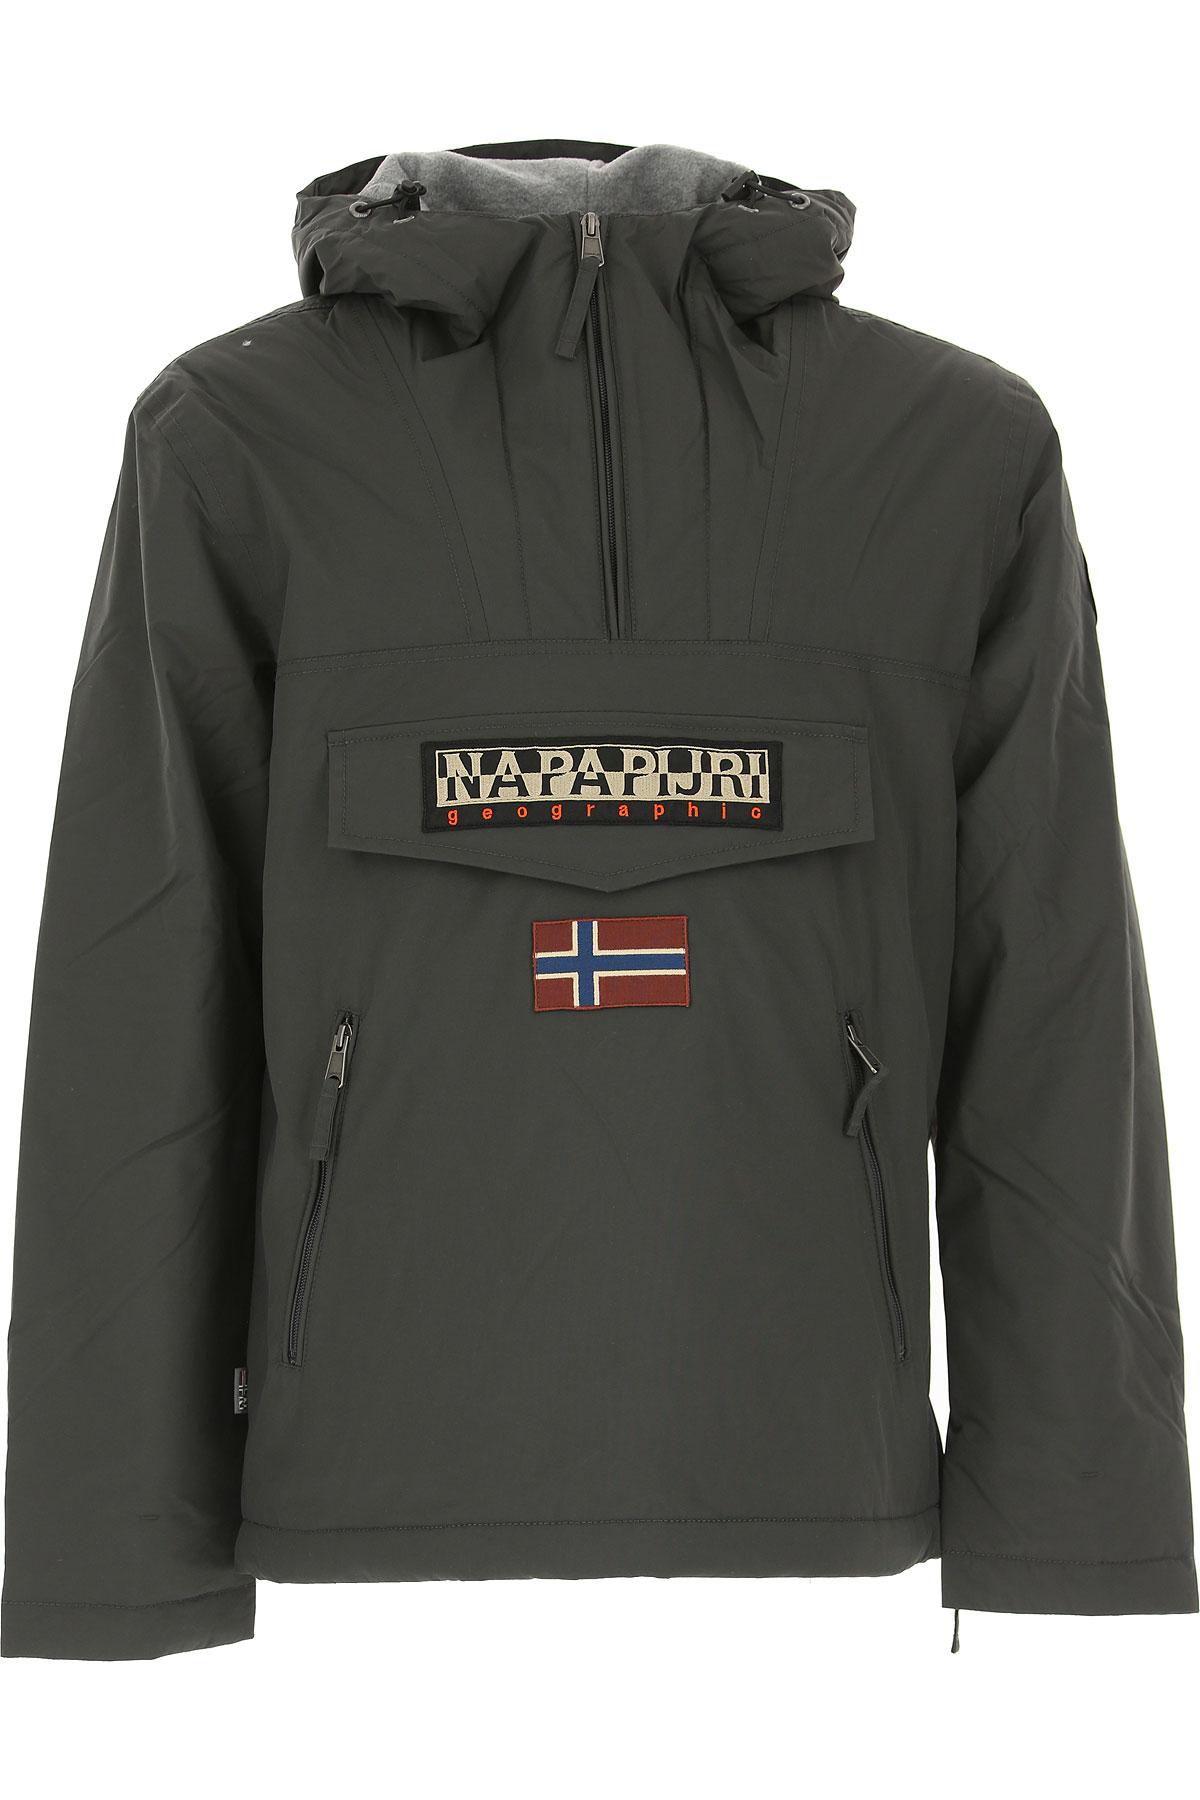 Napapijri Down Jacket for Men, Puffer Ski Jacket On Sale, Dark Anthracite Grey, polyestere, 2019, L XL